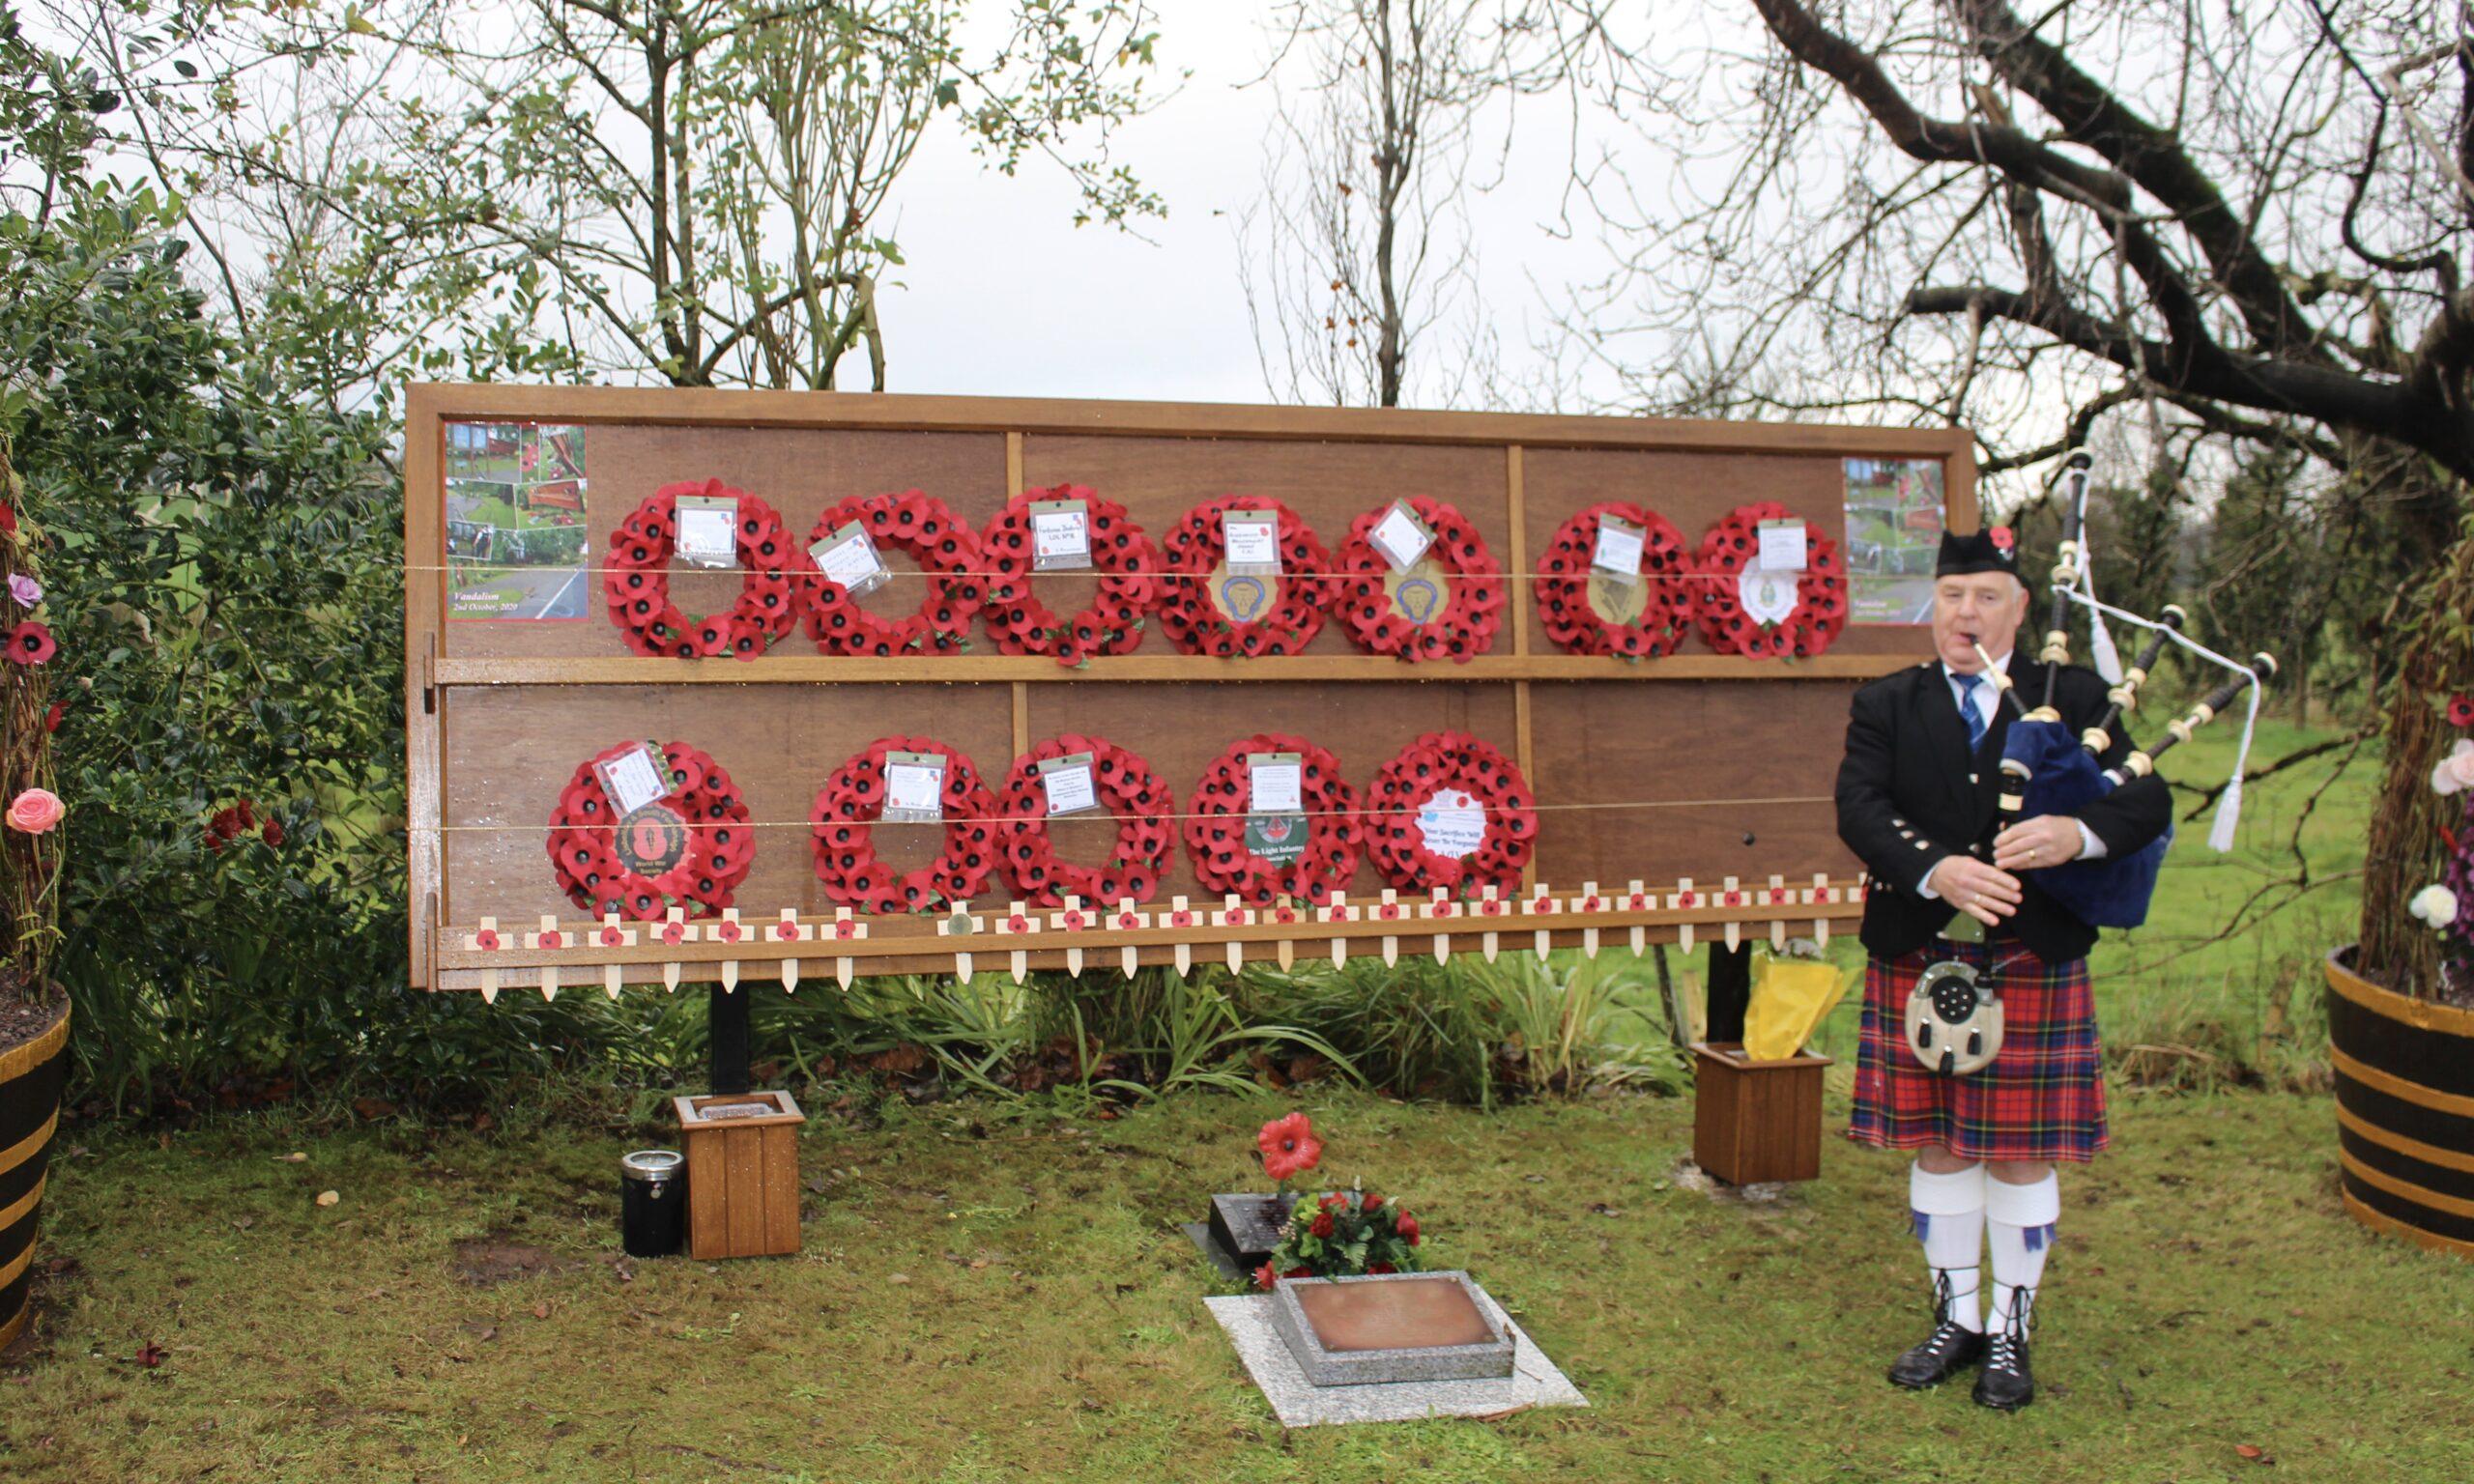 https://seff.org.uk/wp-content/uploads/2020/11/Remembrance-Ballygawley-scaled.jpeg